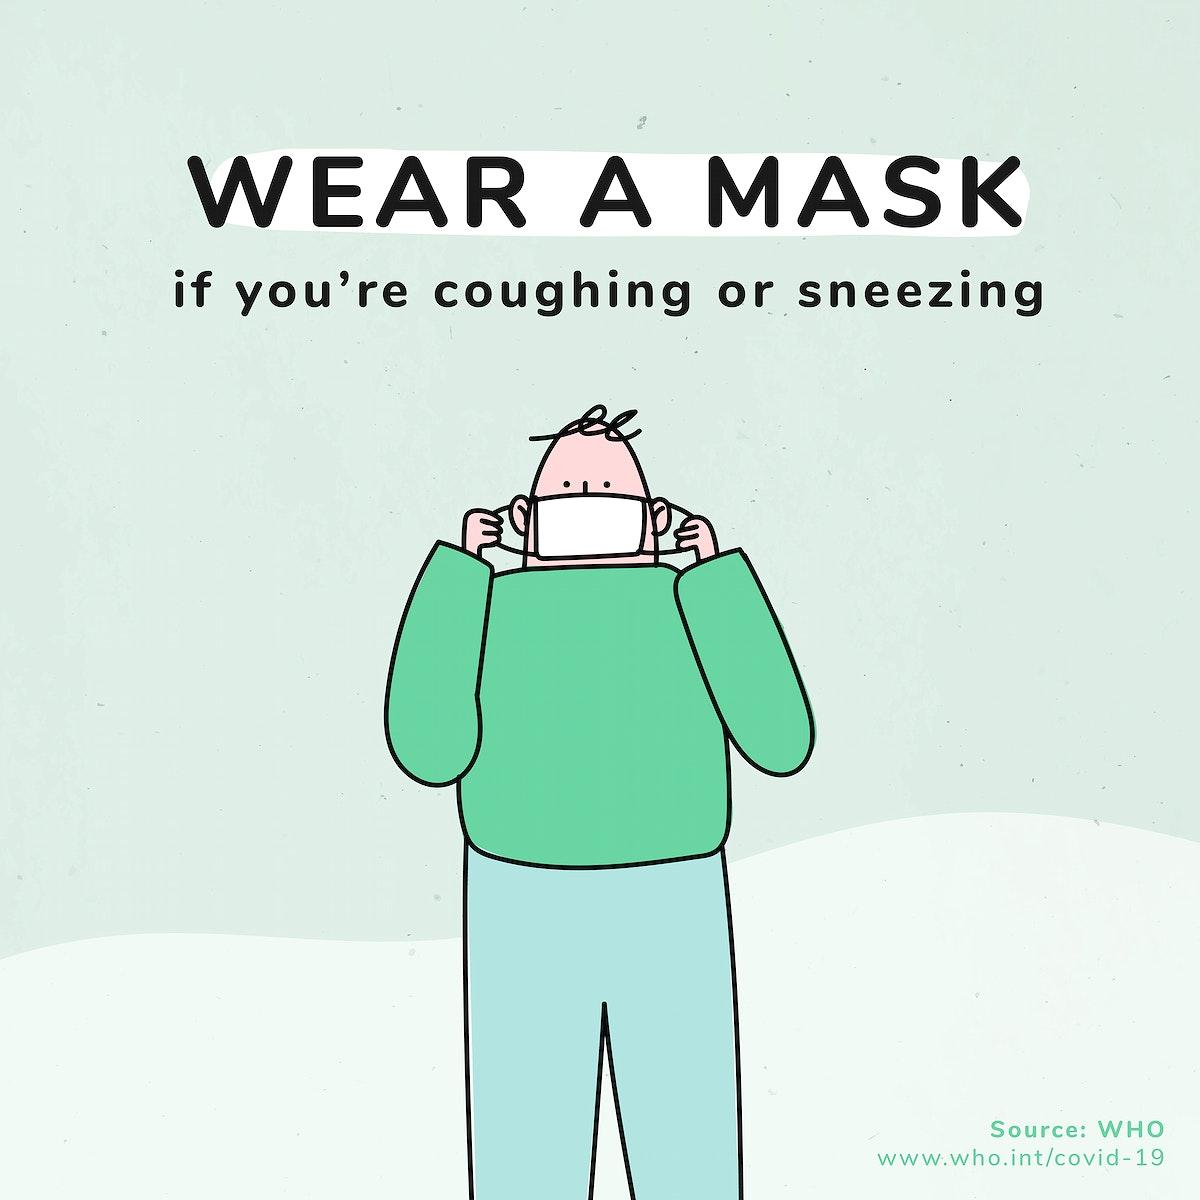 Wear a mask coronavirus pandemic social template source WHO vector